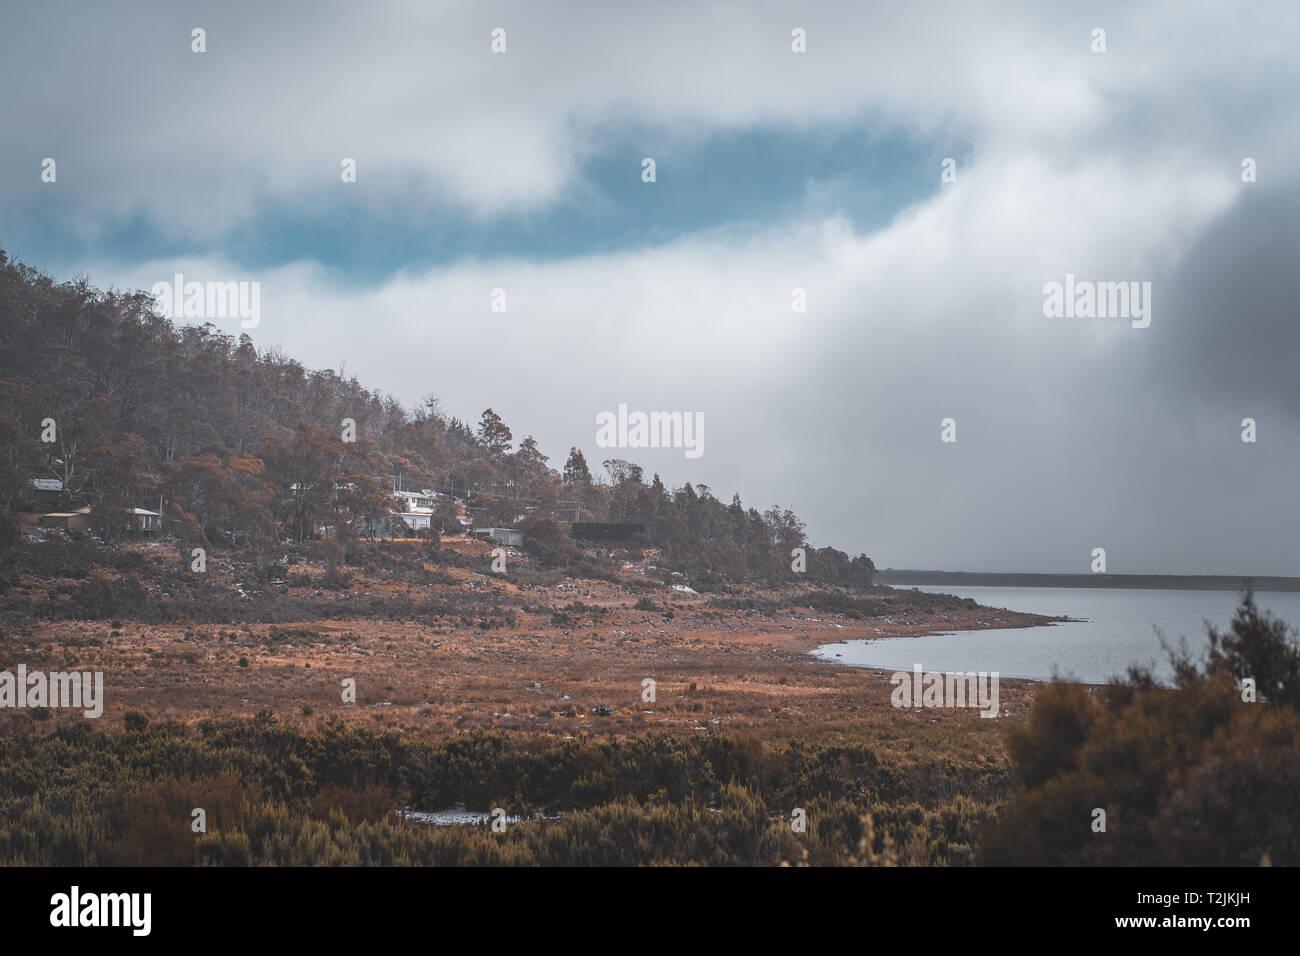 Tasmania Cloudy Shore - Stock Image